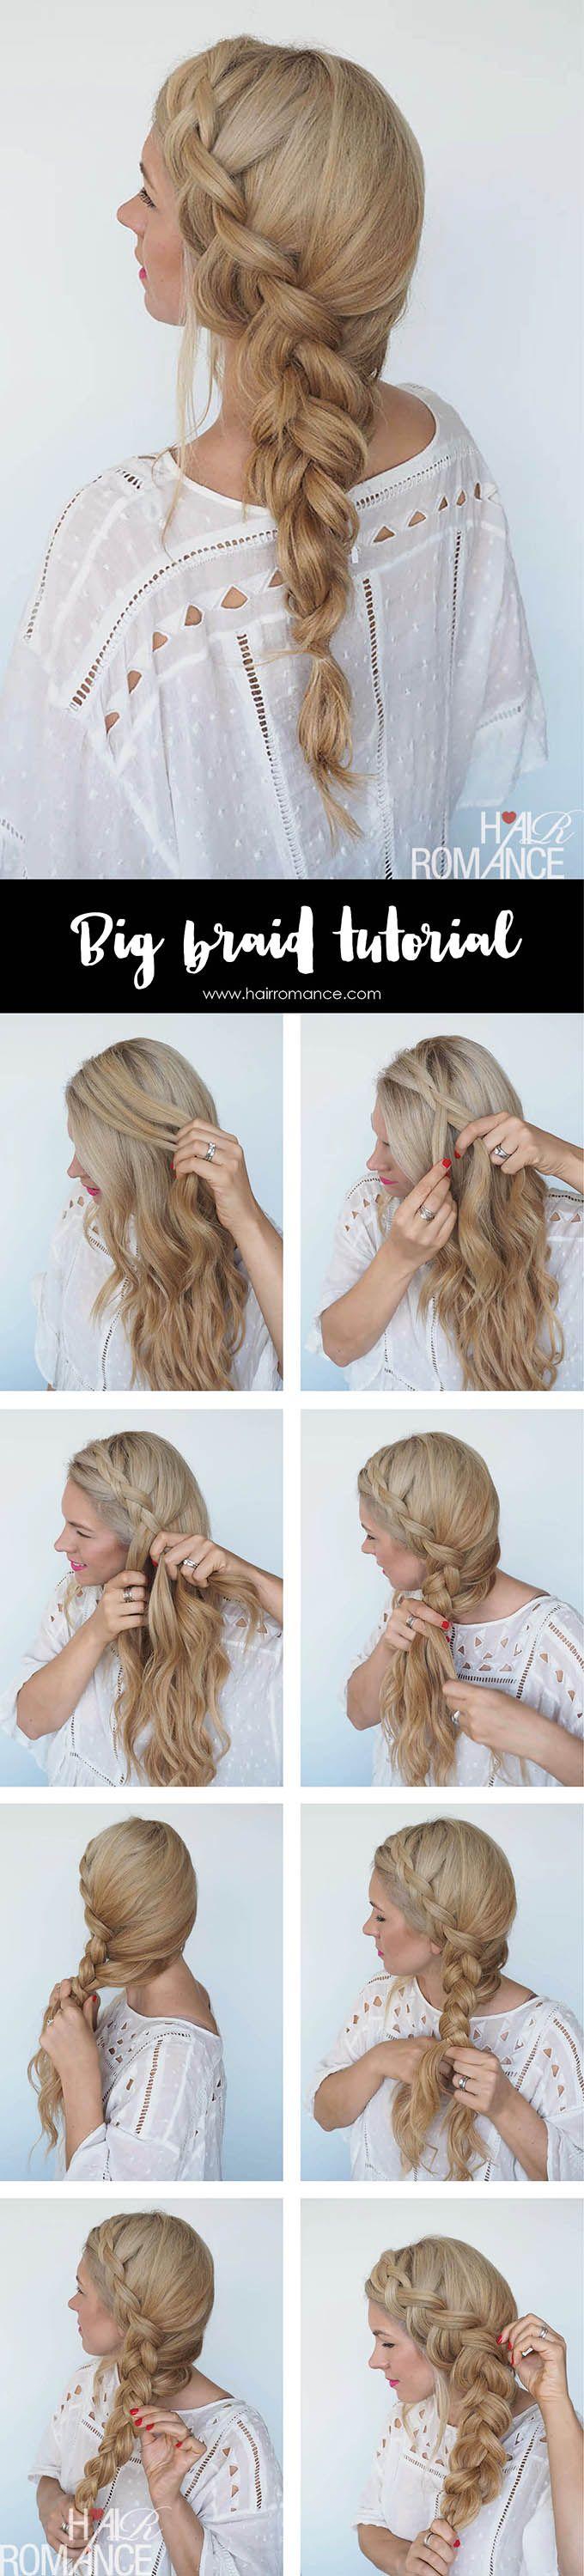 How To Style A Big Side Braid Instant Mermaid Hair Hair Romance Braided Hairstyles Tutorials Mermaid Hair Tutorials Hair Tutorials Easy